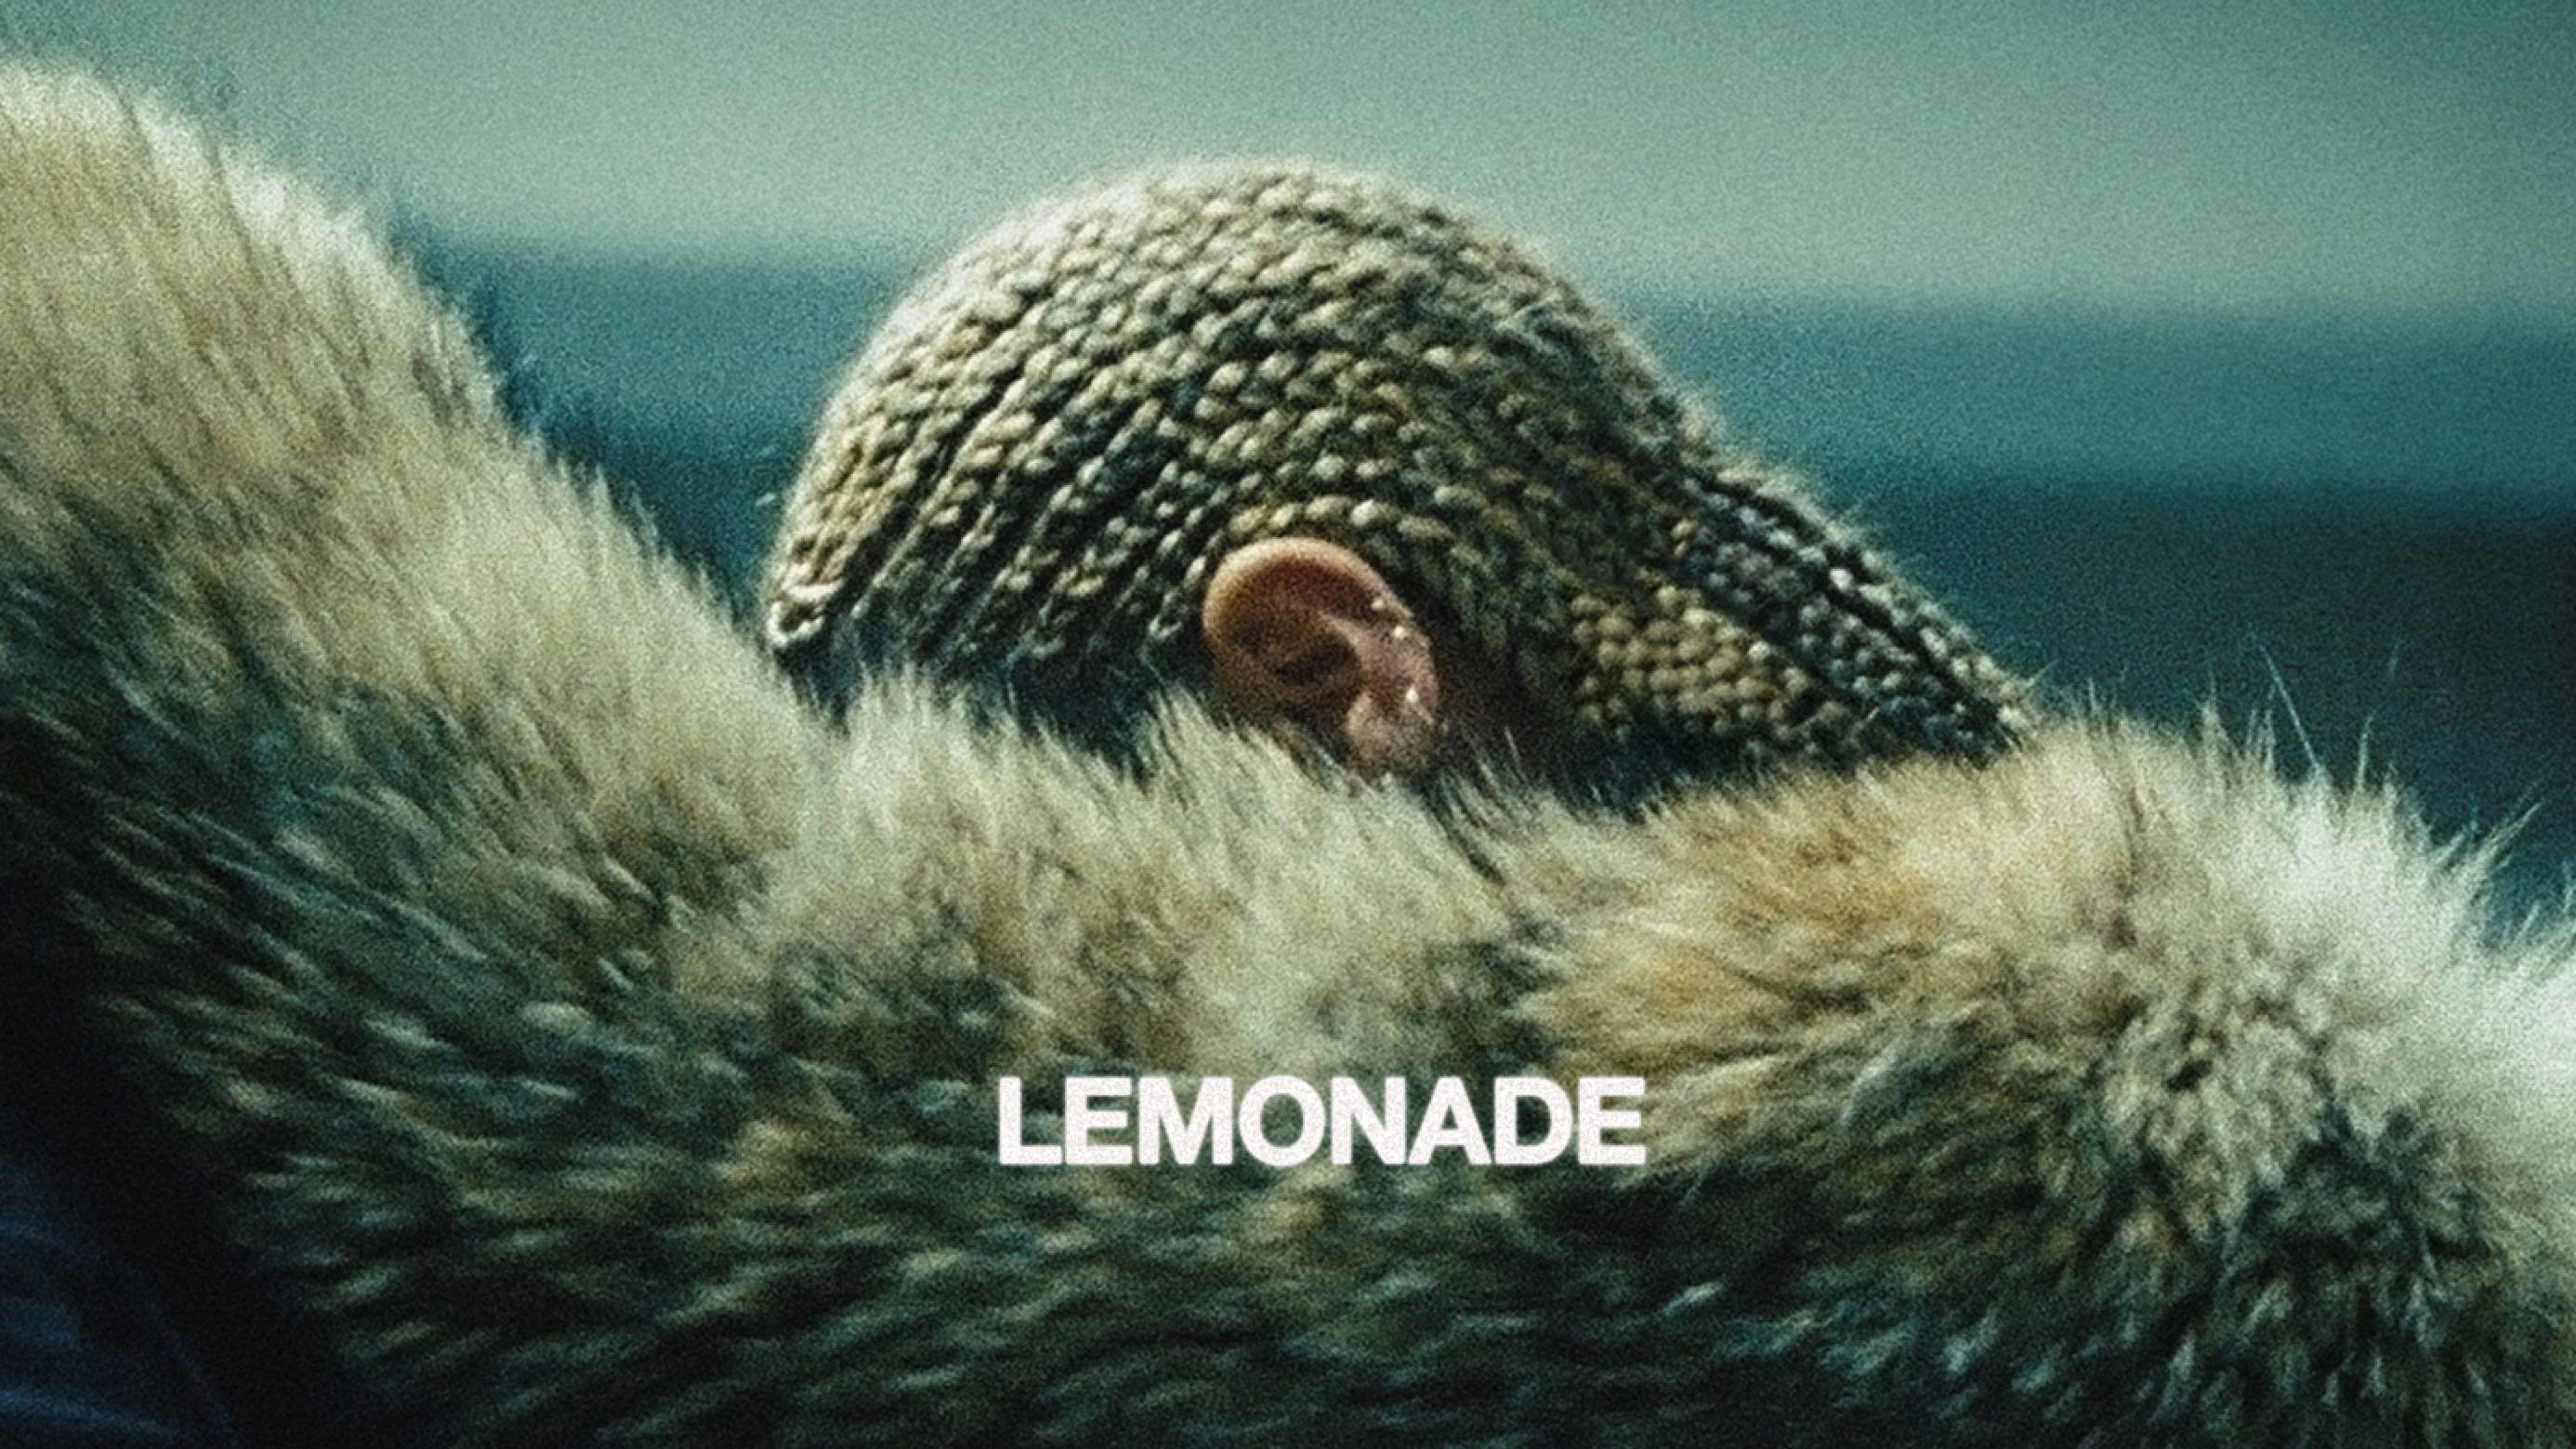 Beyonce Lemonade Wallpapers Top Free Beyonce Lemonade Backgrounds Wallpaperaccess